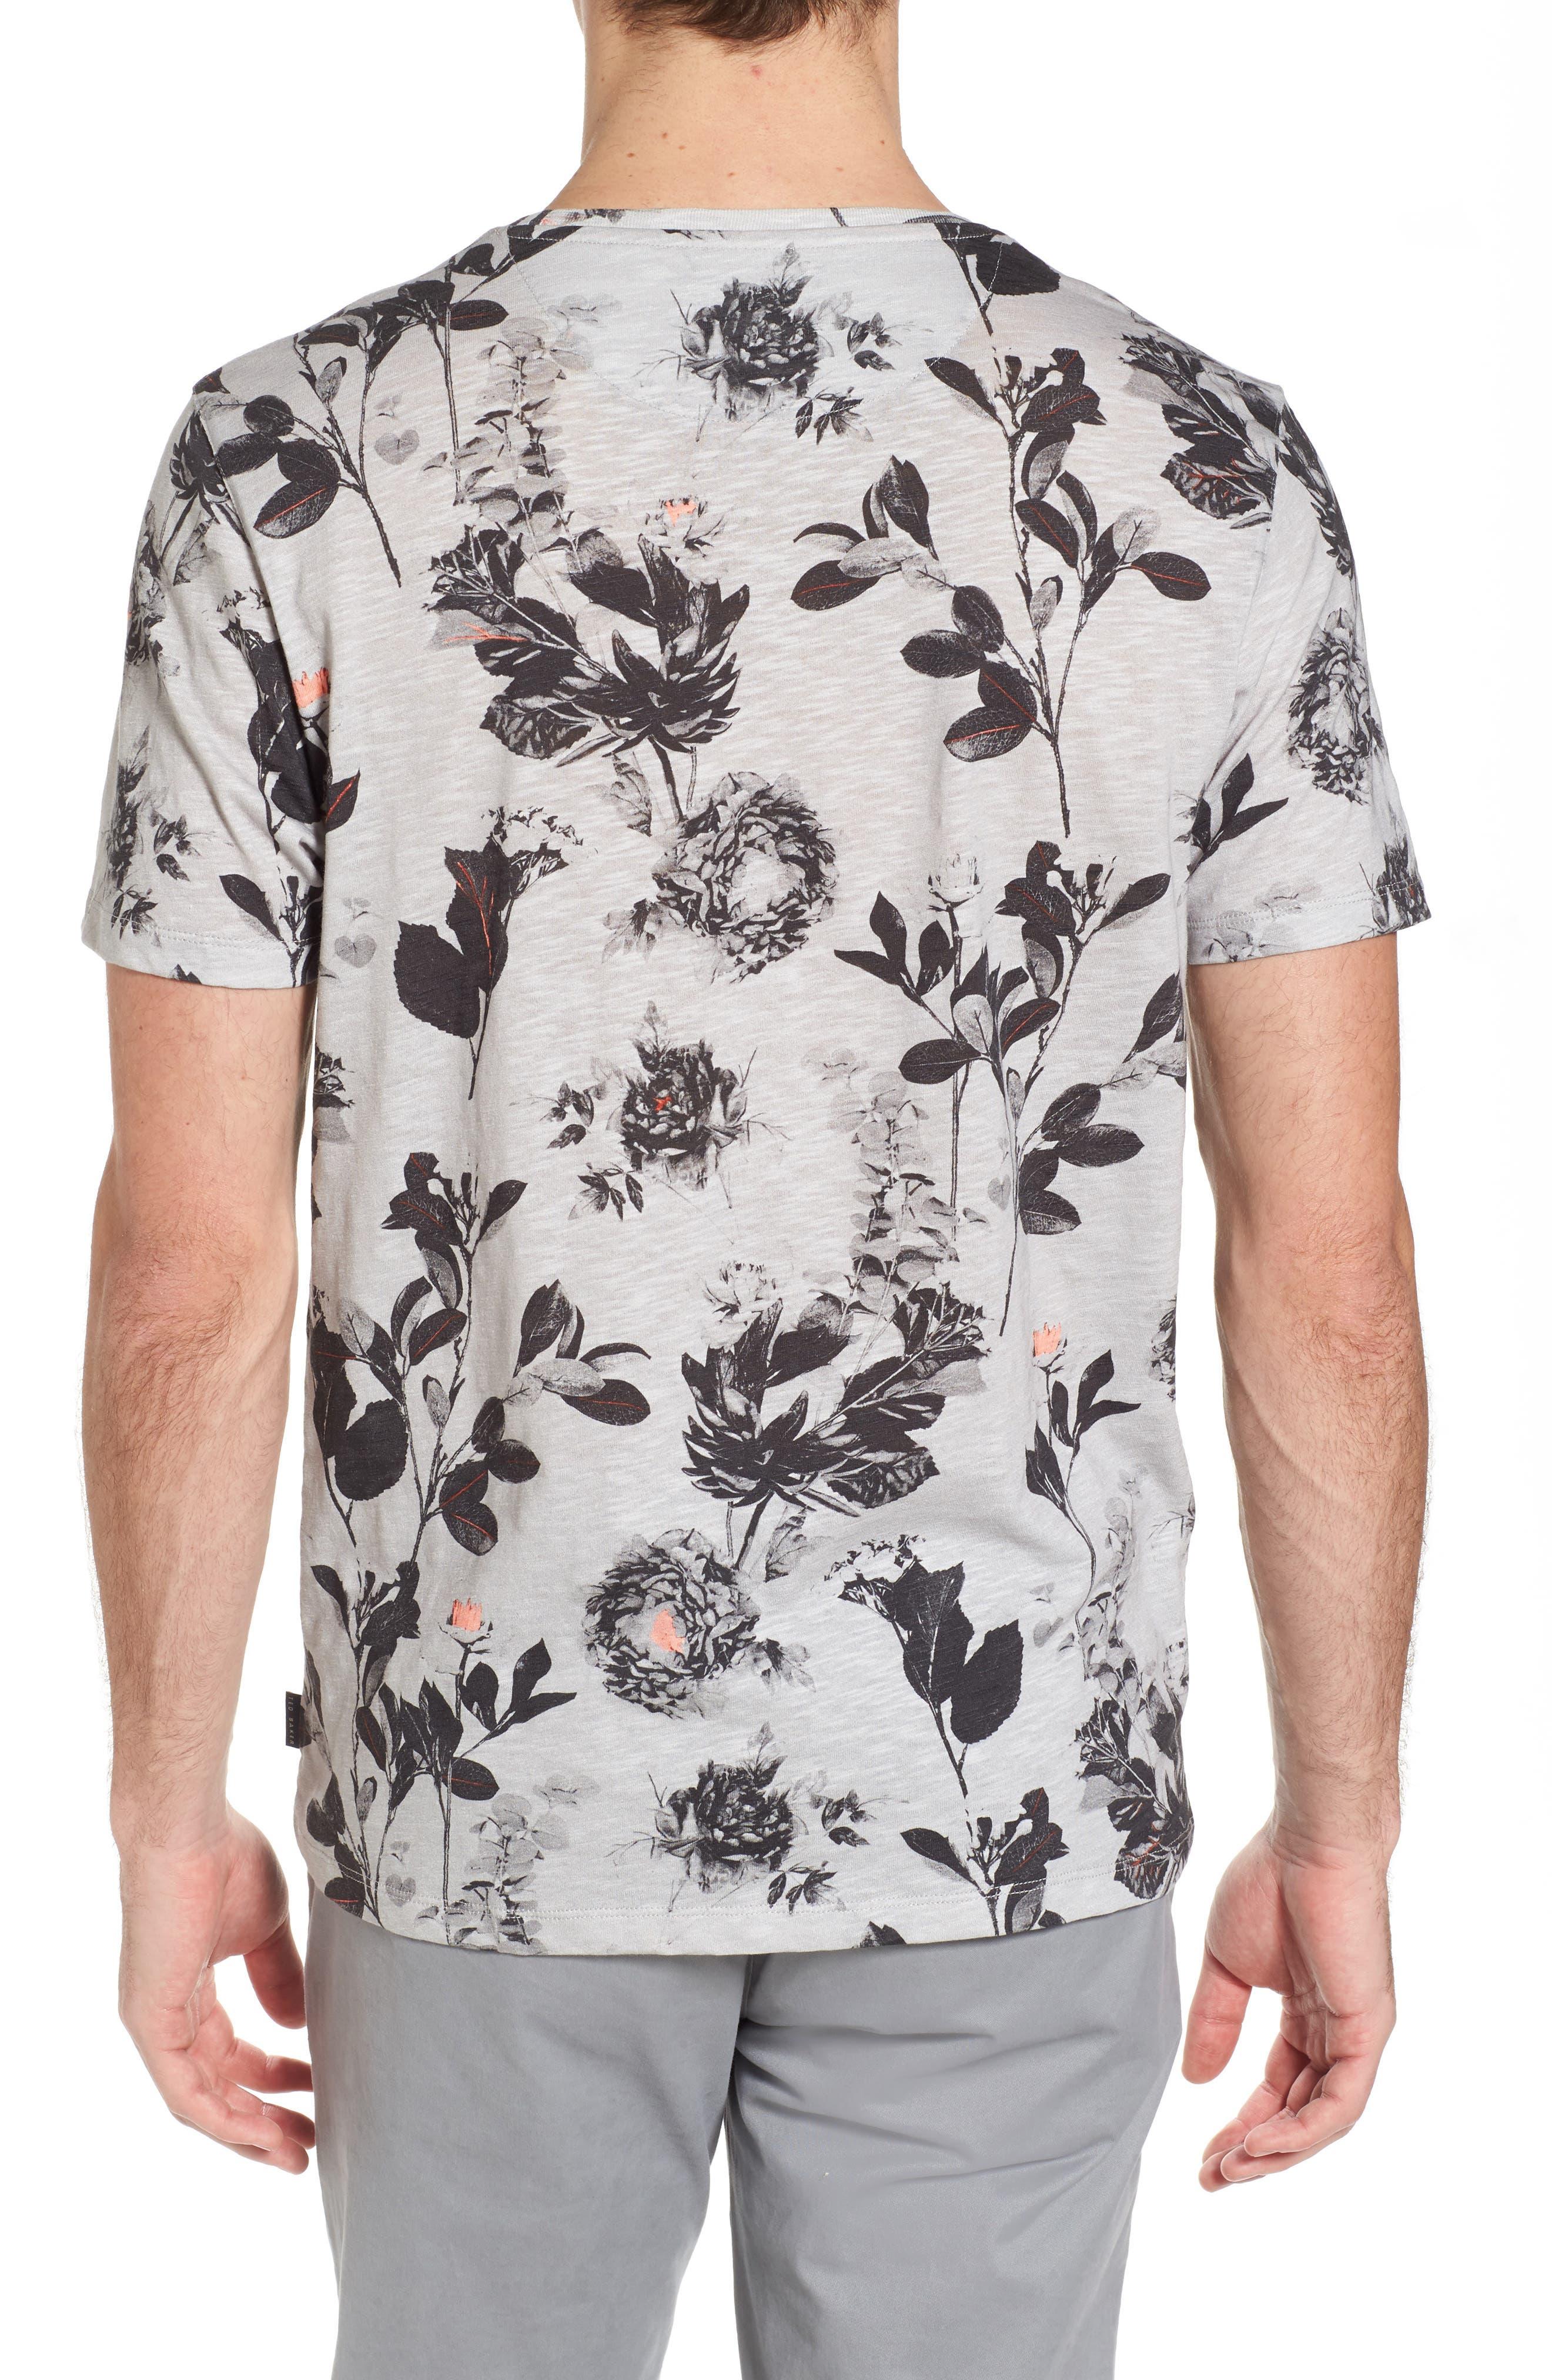 Doberma Trim Fit Floral Print T-Shirt,                             Alternate thumbnail 2, color,                             Grey